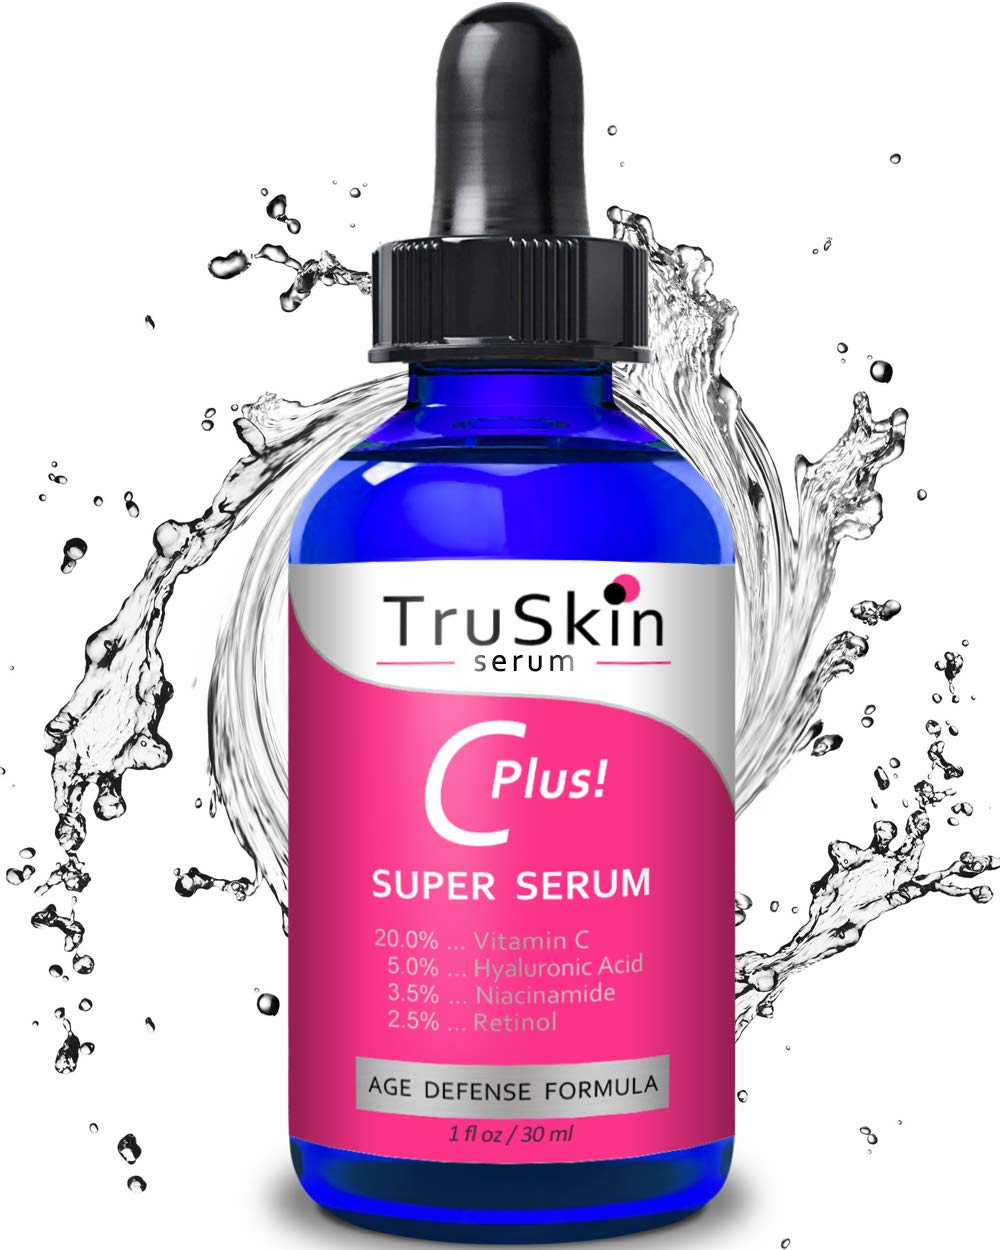 TruSkin Vitamin C-Plus Super Serum, Anti Aging Anti-Wrinkle Facial Serum with Niacinamide, Retinol, Hyaluronic Acid, and Salicylic Acid, 1 oz by TruSkin Naturals